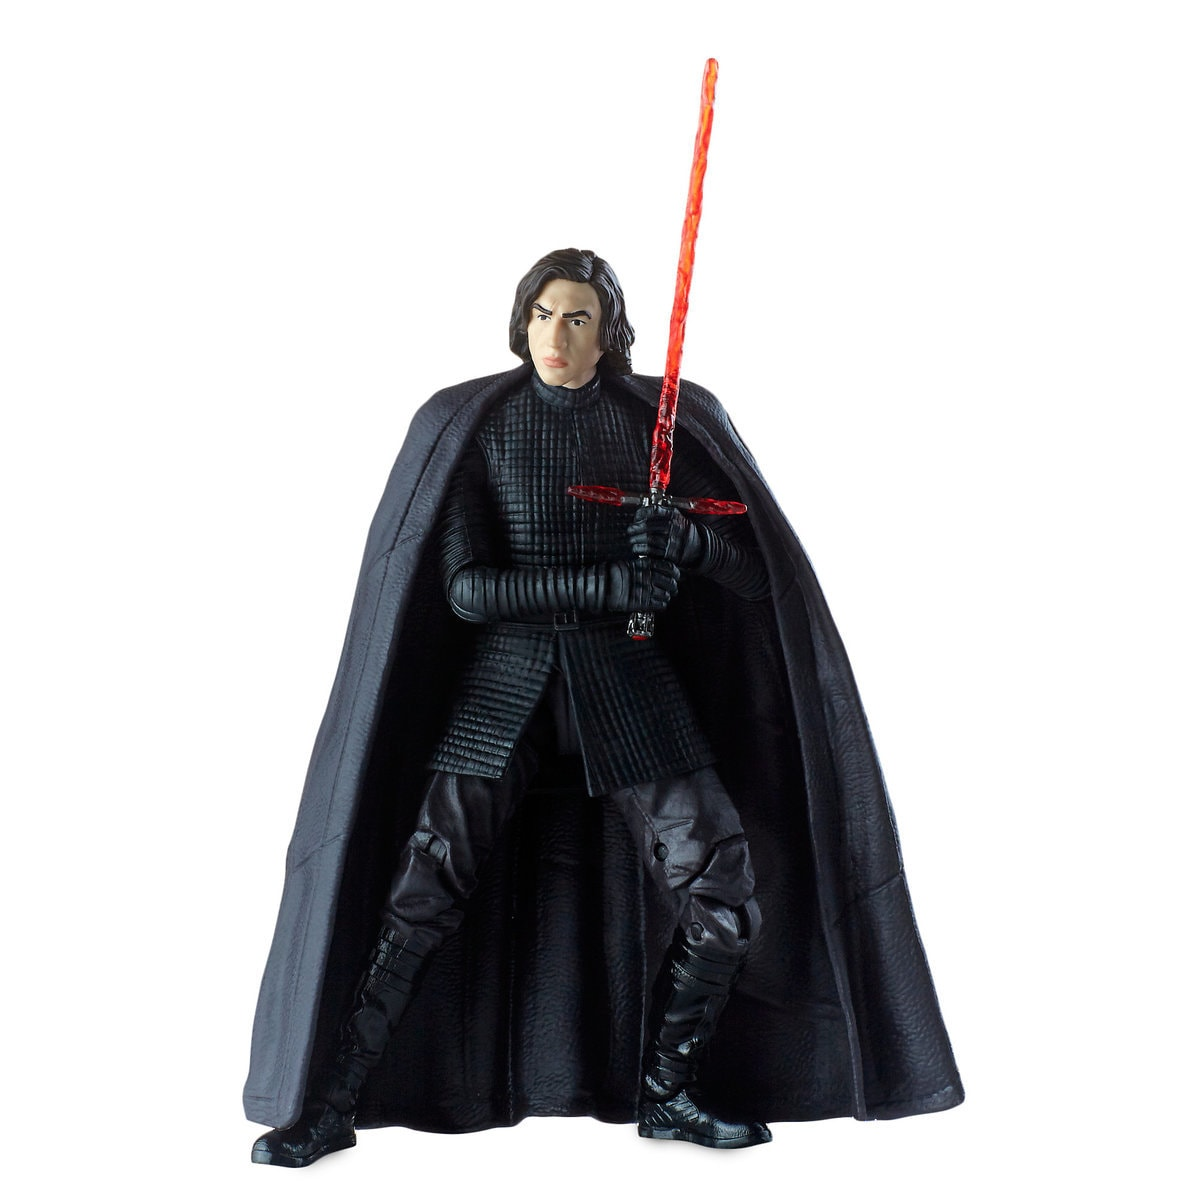 Kylo Ren Star Wars Episode 8 The Last Jedi Action Figure Brand New